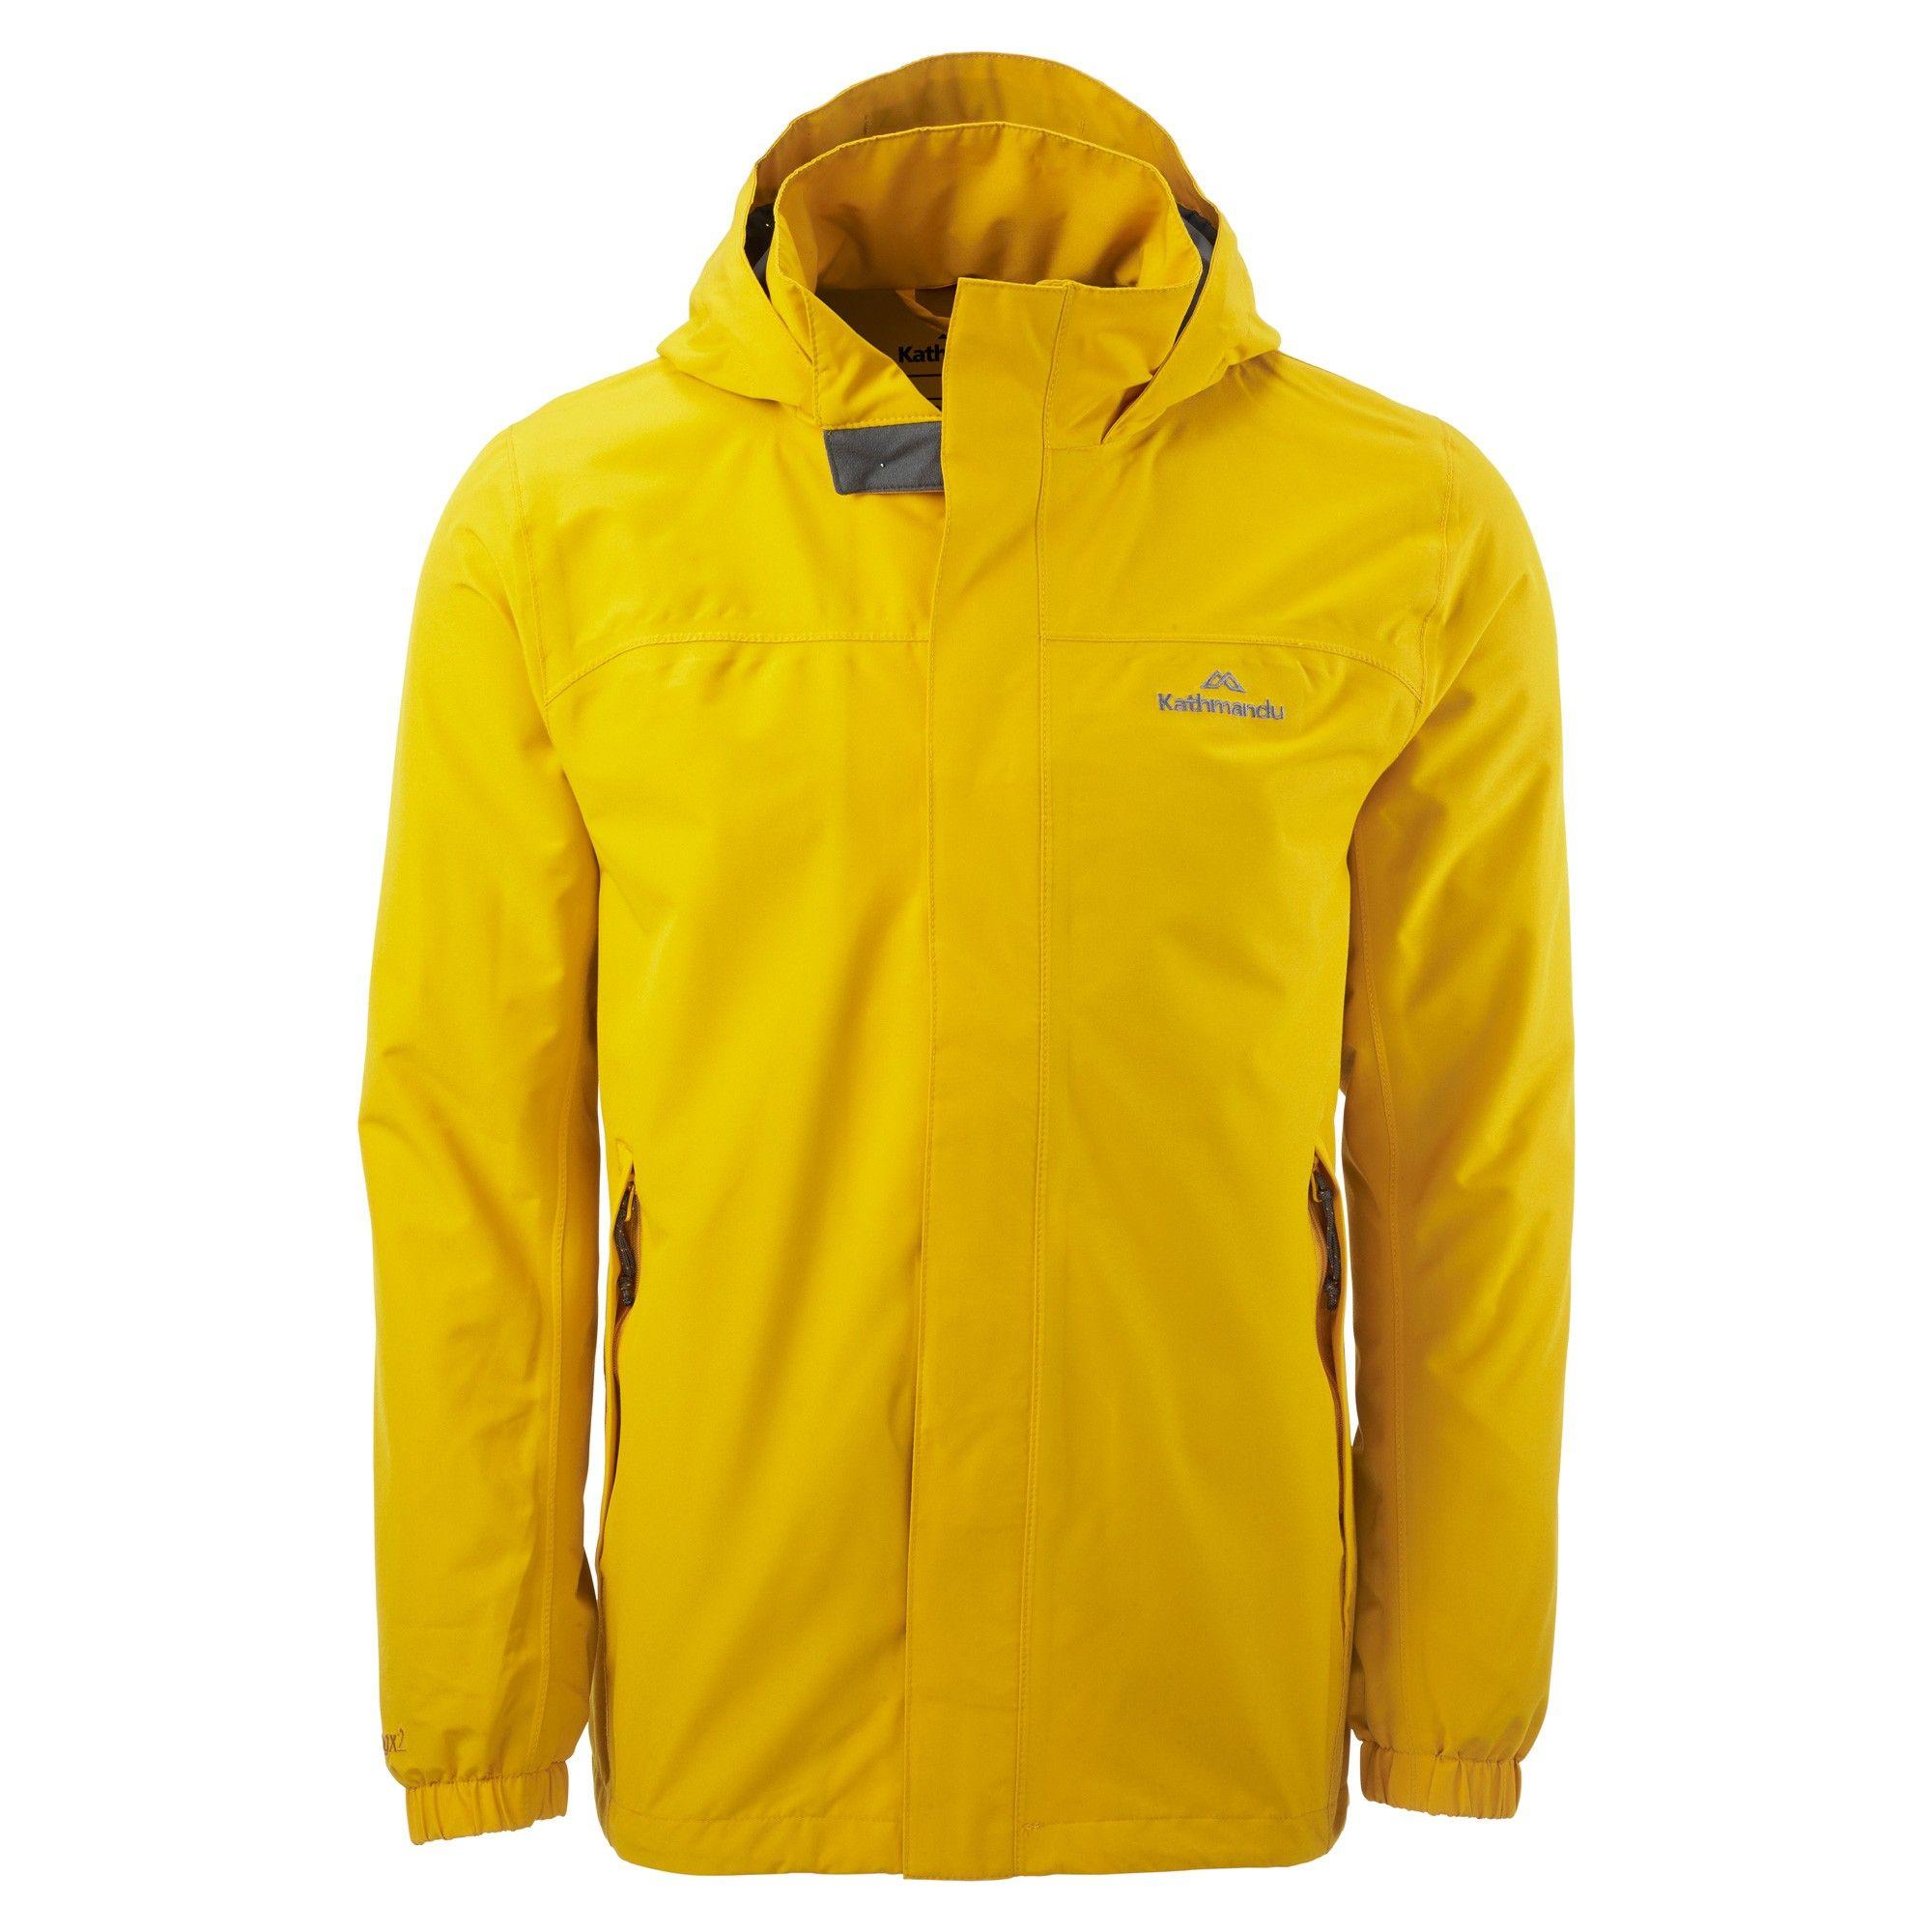 Buy Andulo Men's 2 Layer Waterproof Jacket - Gold online at ...